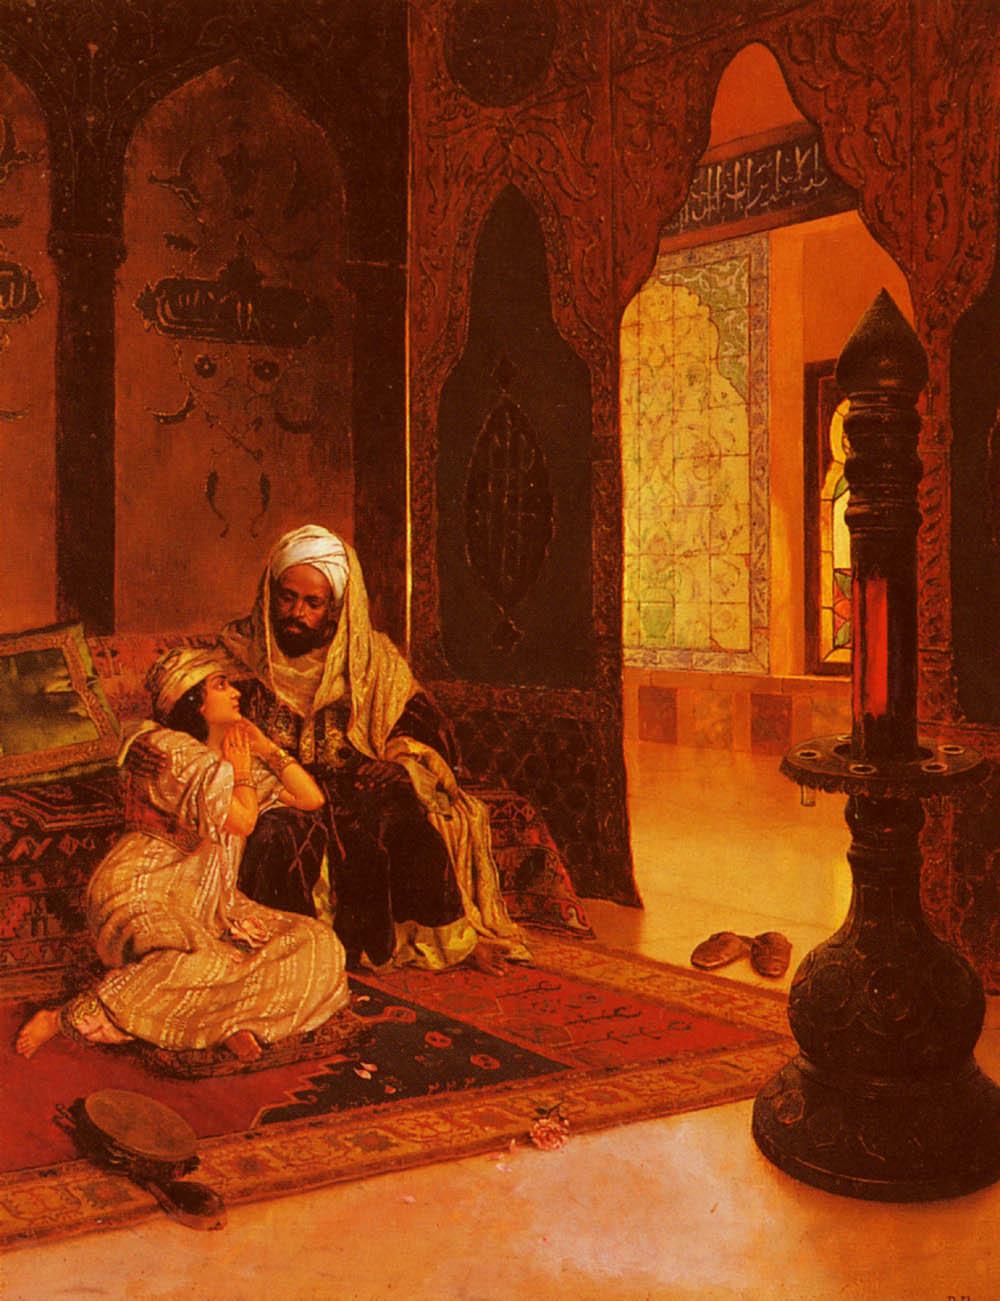 Harem favourite :: Rudolf Ernst - Arab women (Harem Life scenes) in art  and painting ôîòî